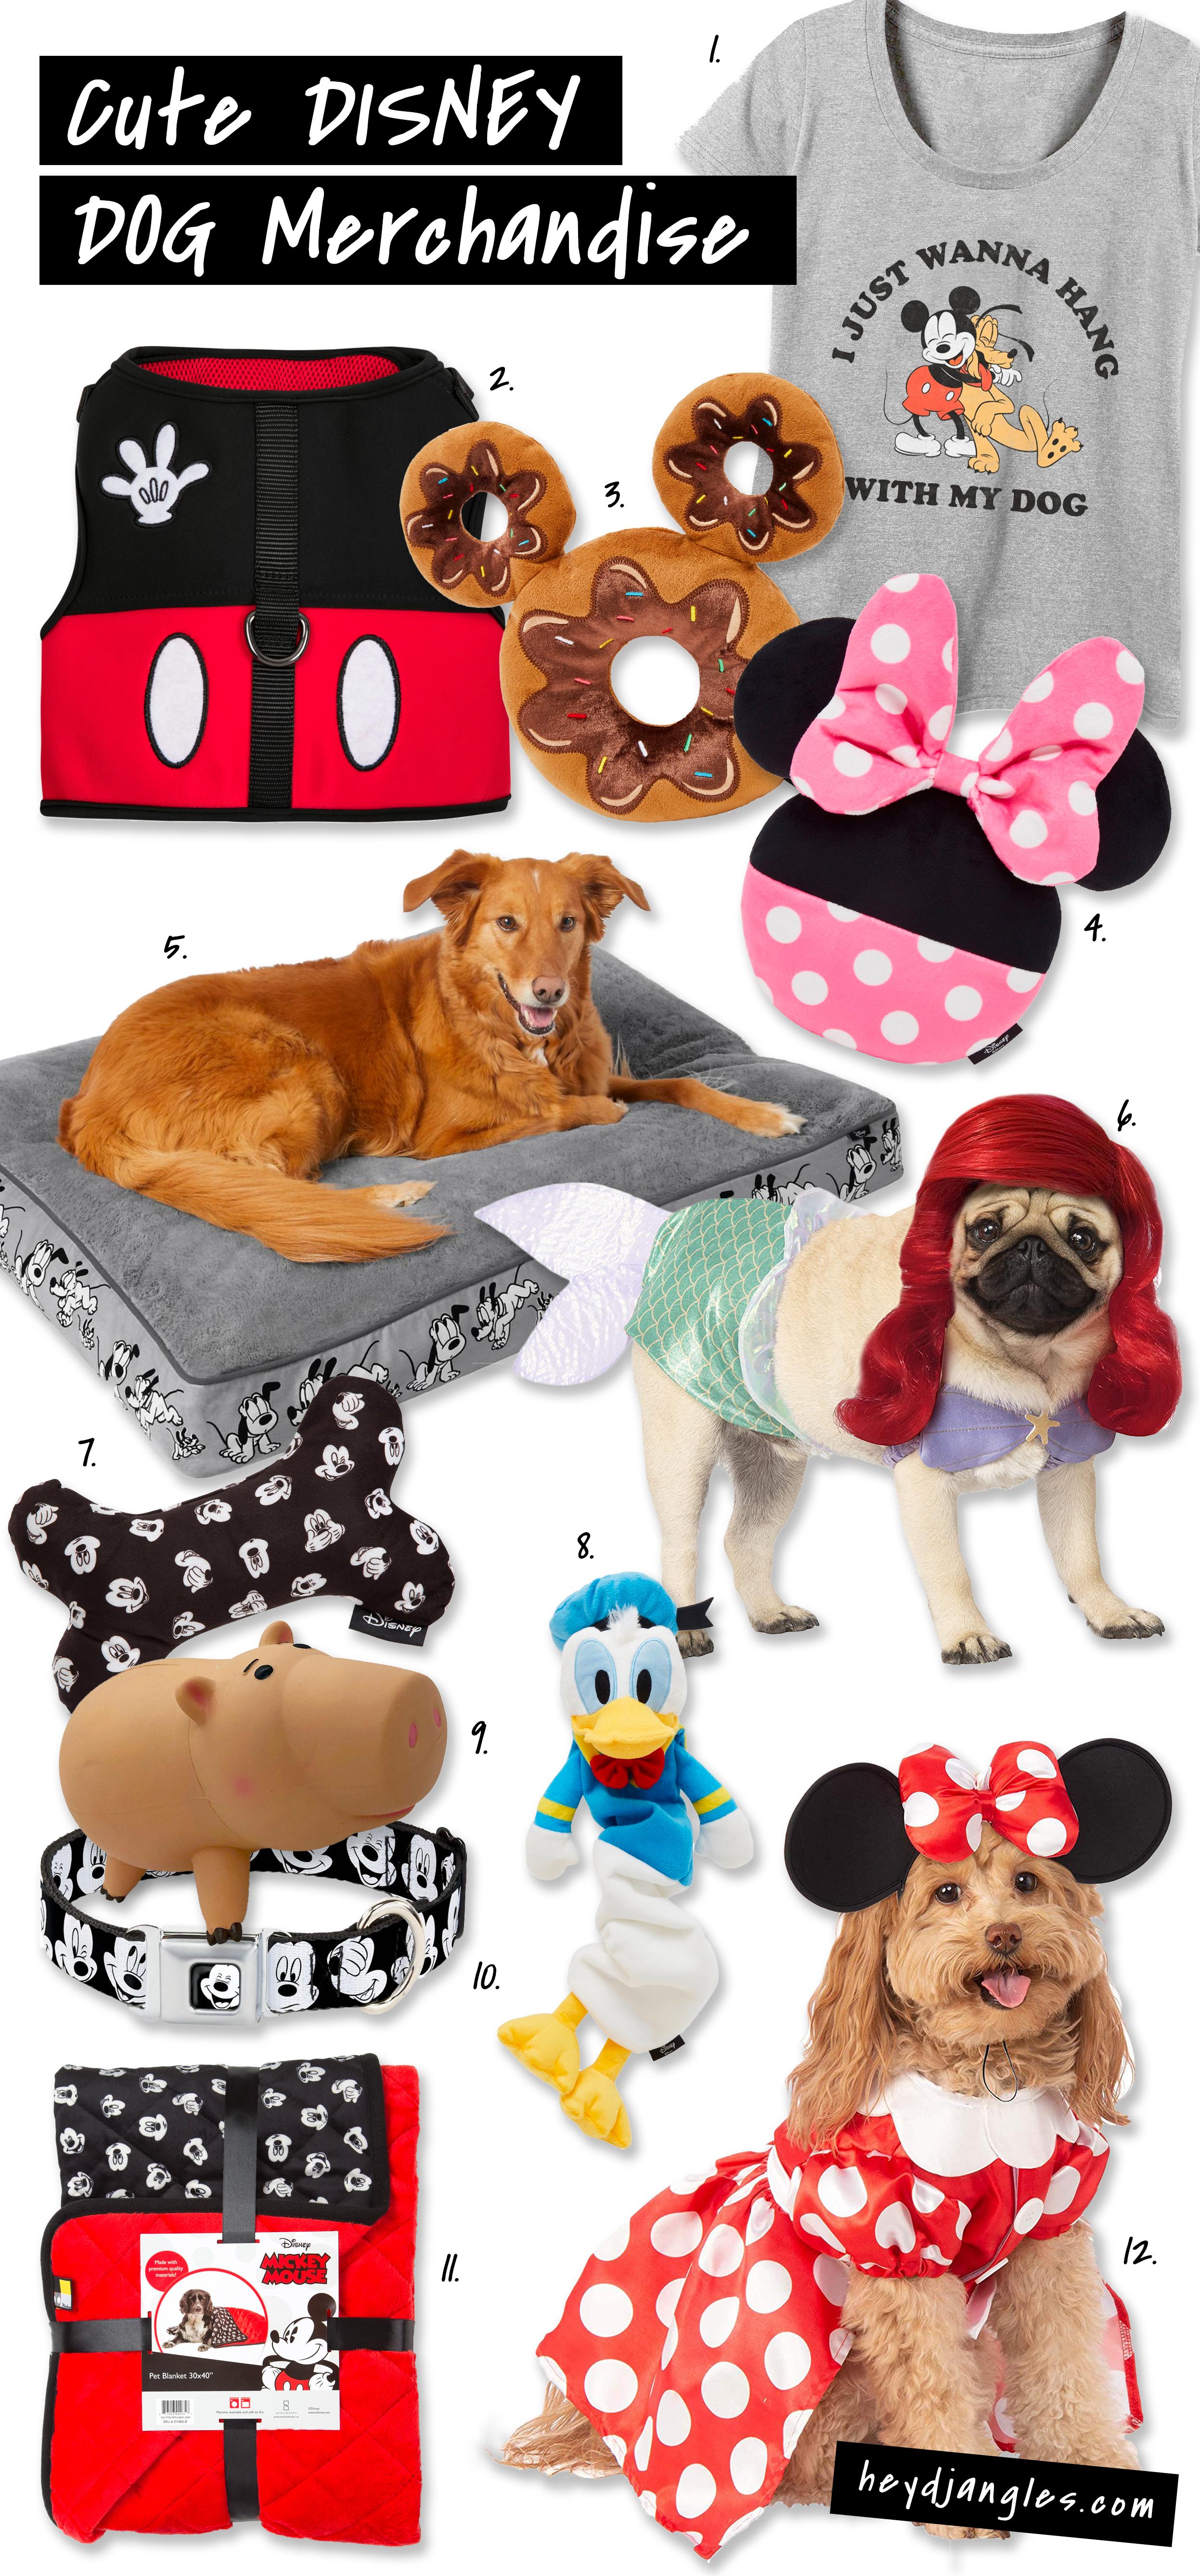 230+ Super Cute Disney Dog Names & Disney Dog Merchandise